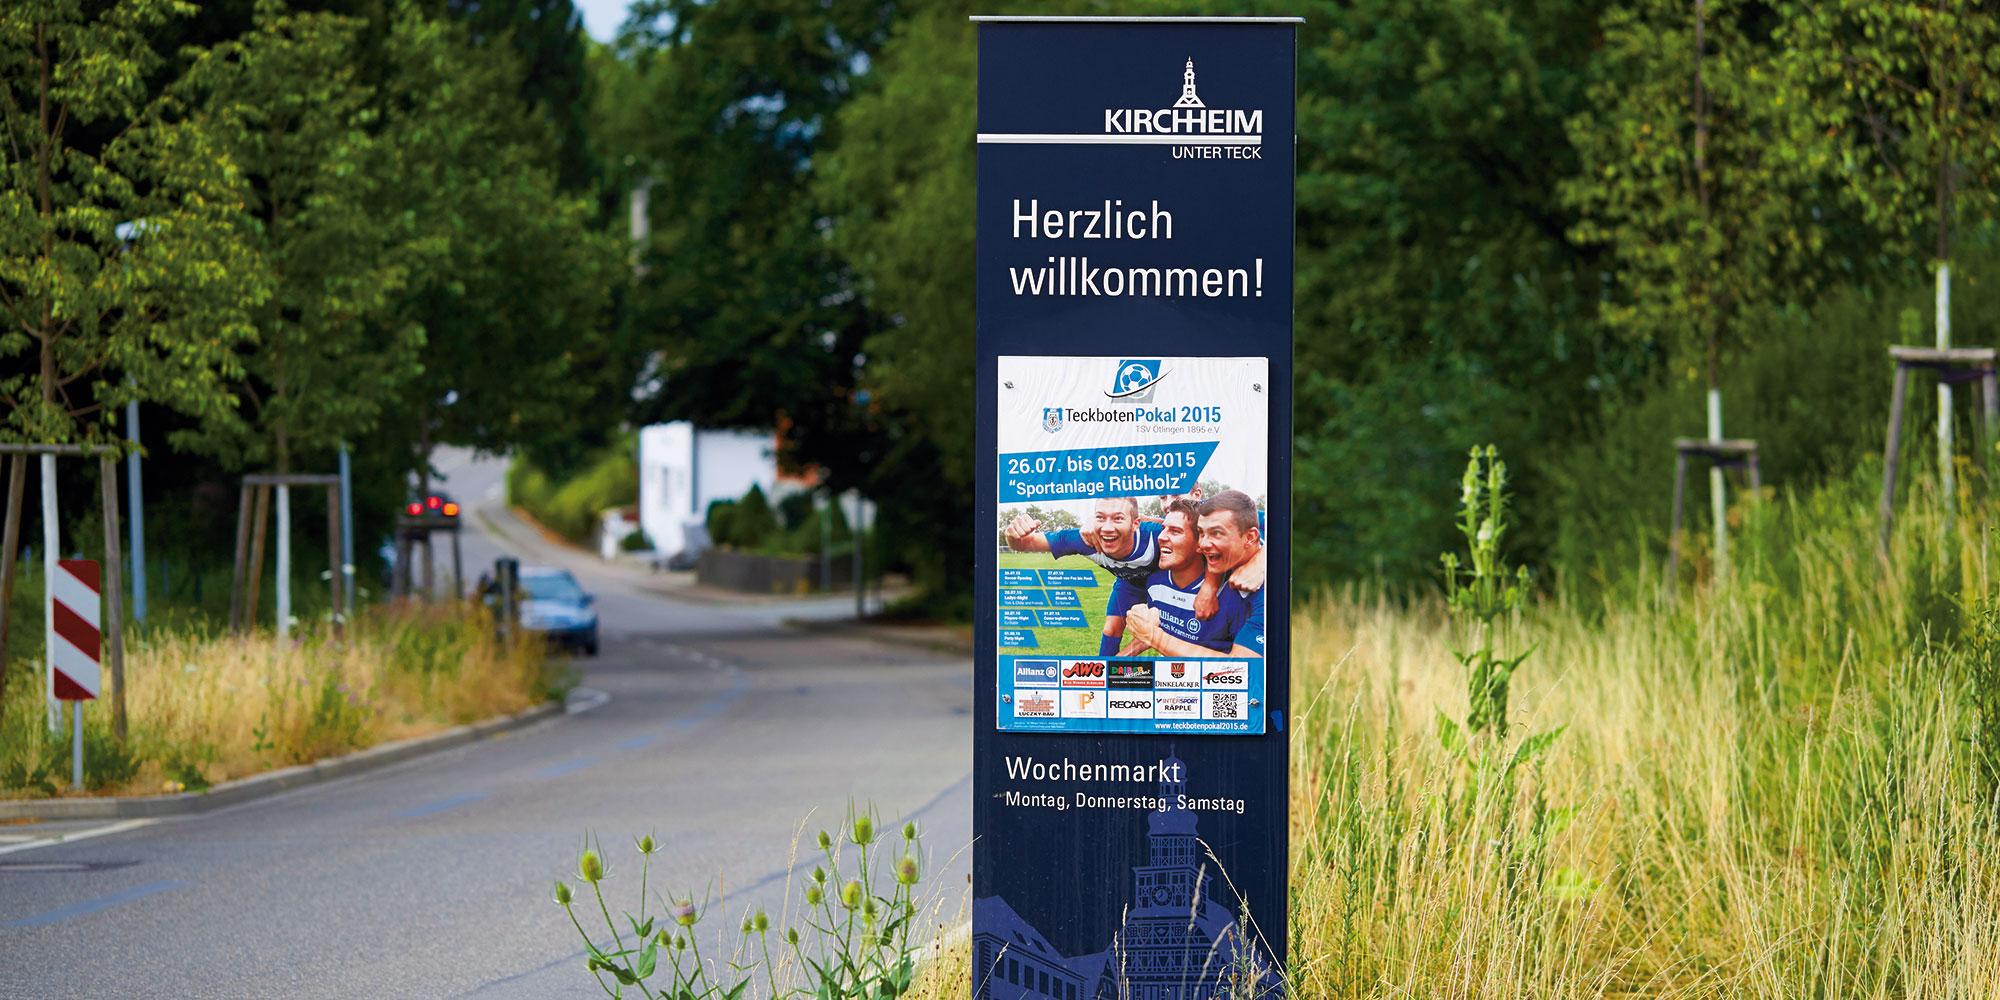 Wegeleitsystem der Stadt Kirchheim unter Teck